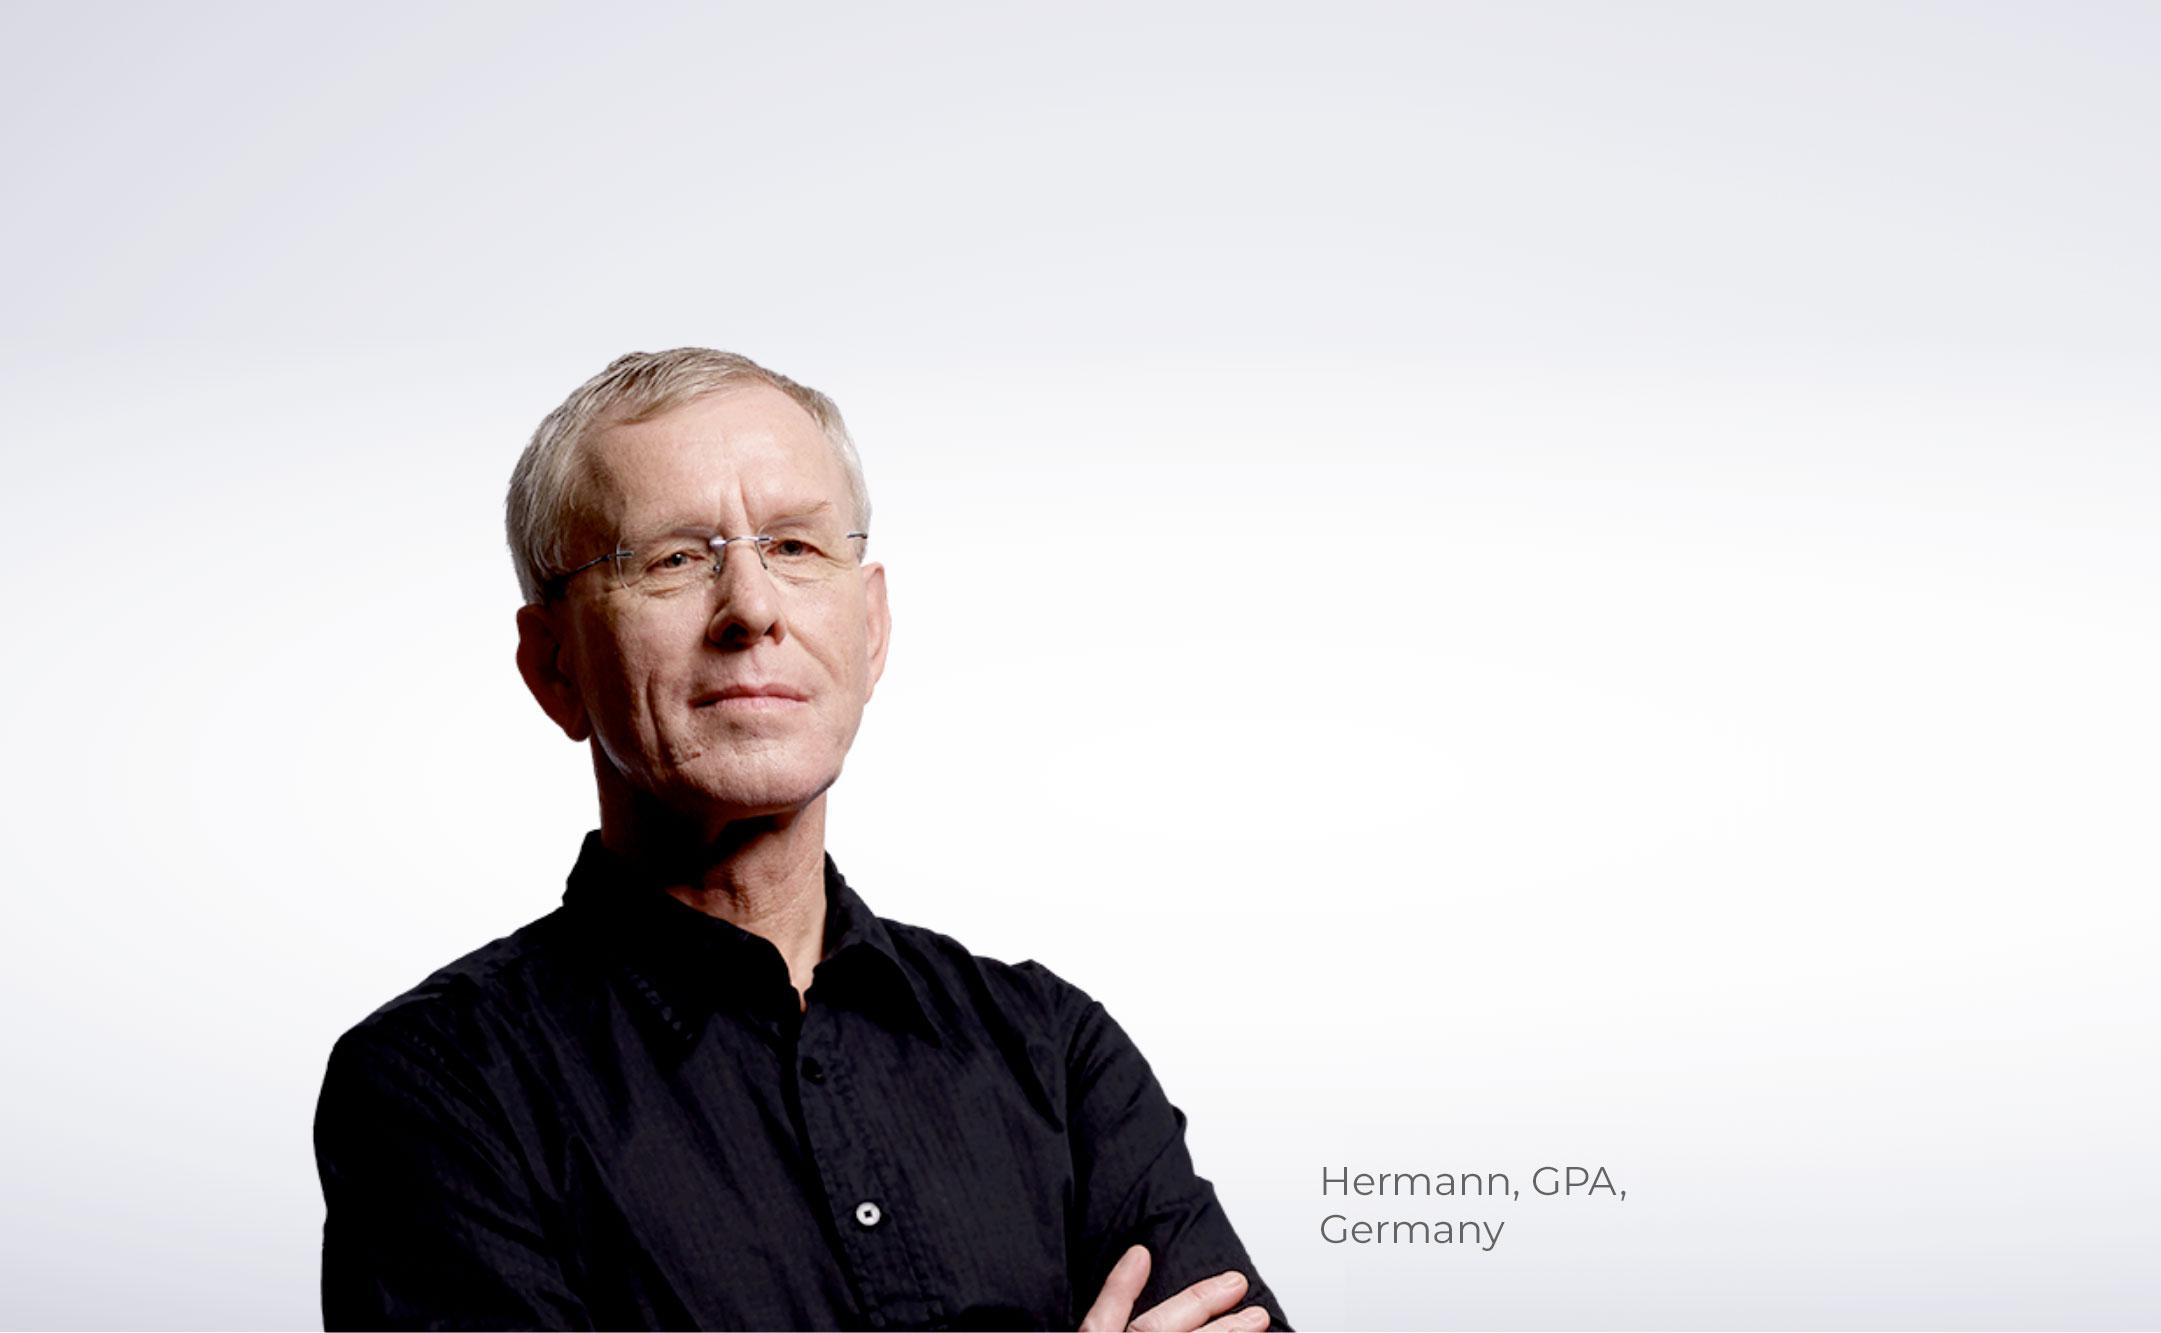 Hermann, GPA, Germany